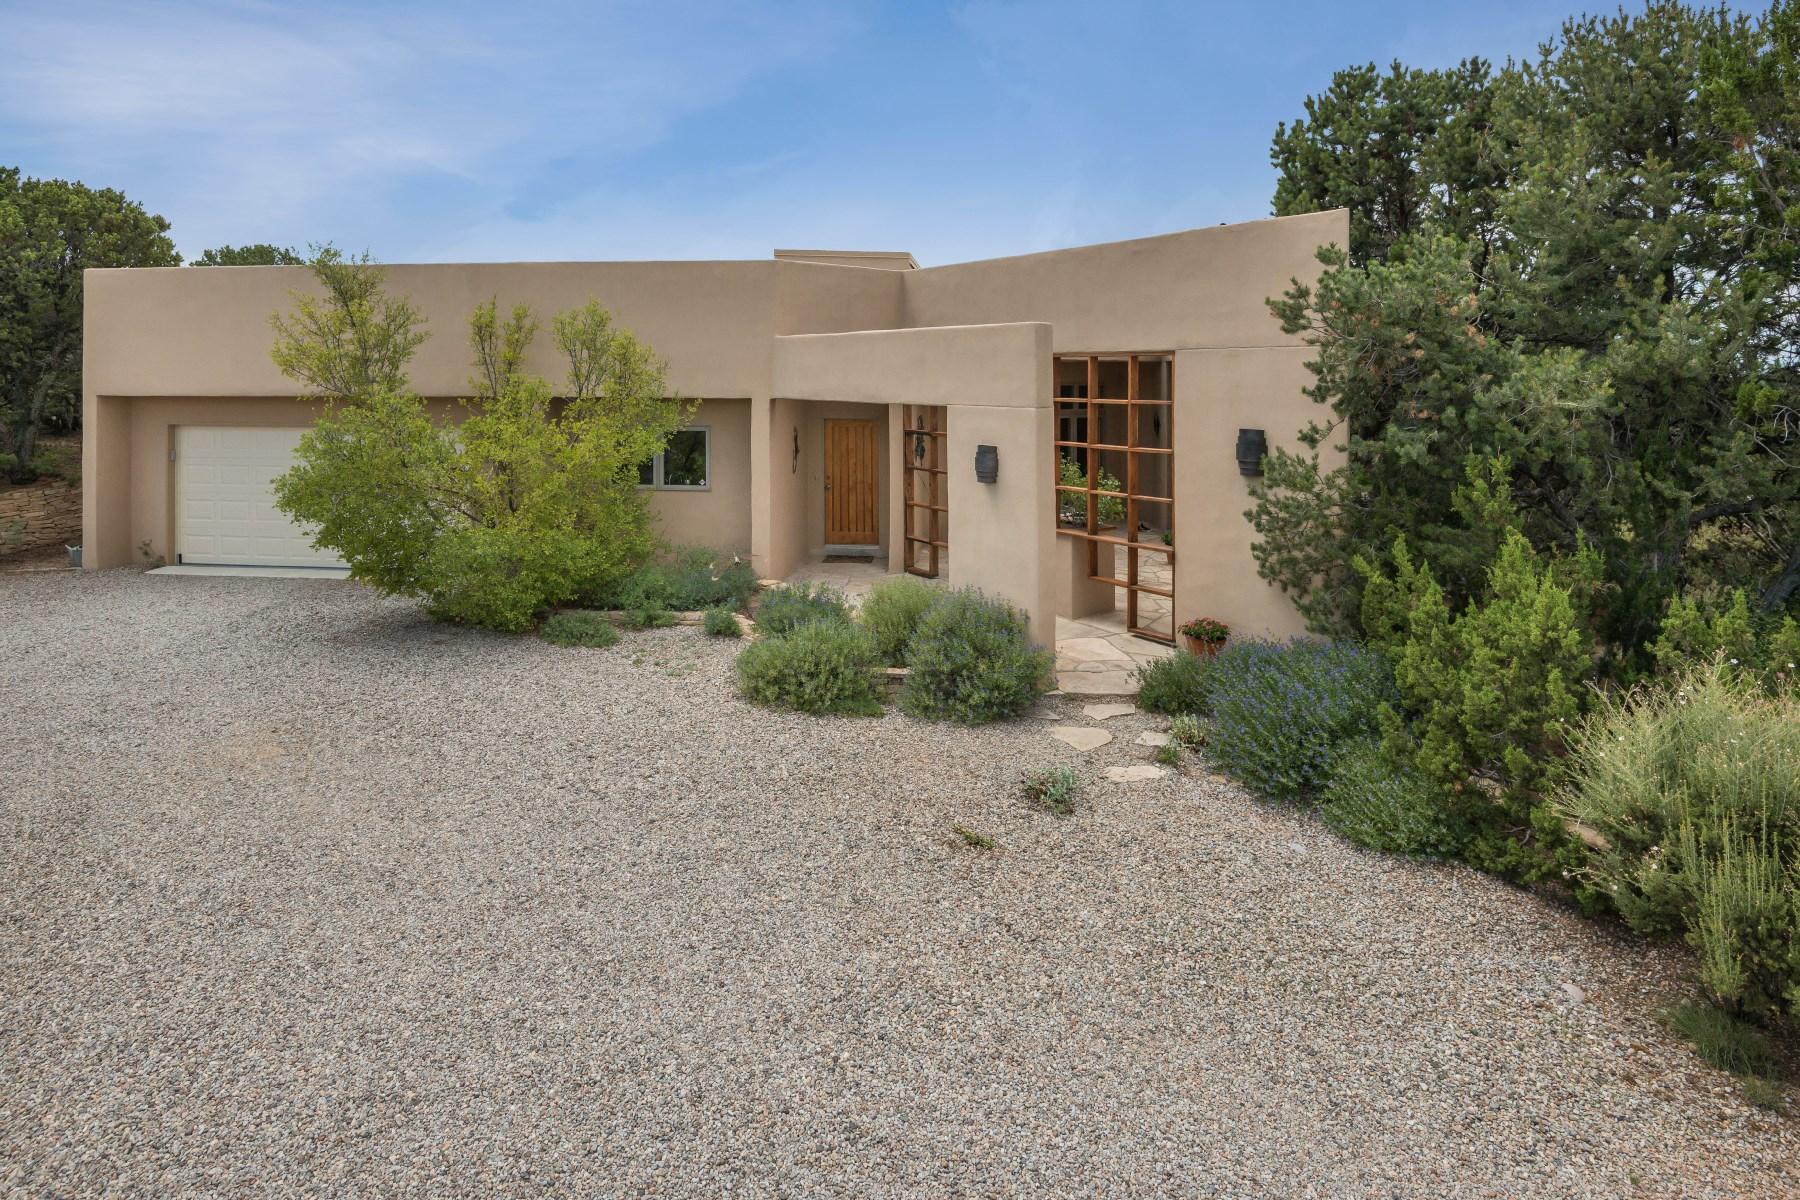 Single Family Home for Sale at 3116 Vista Sandia Northwest Of City Limits, Santa Fe, New Mexico, 87506 United States